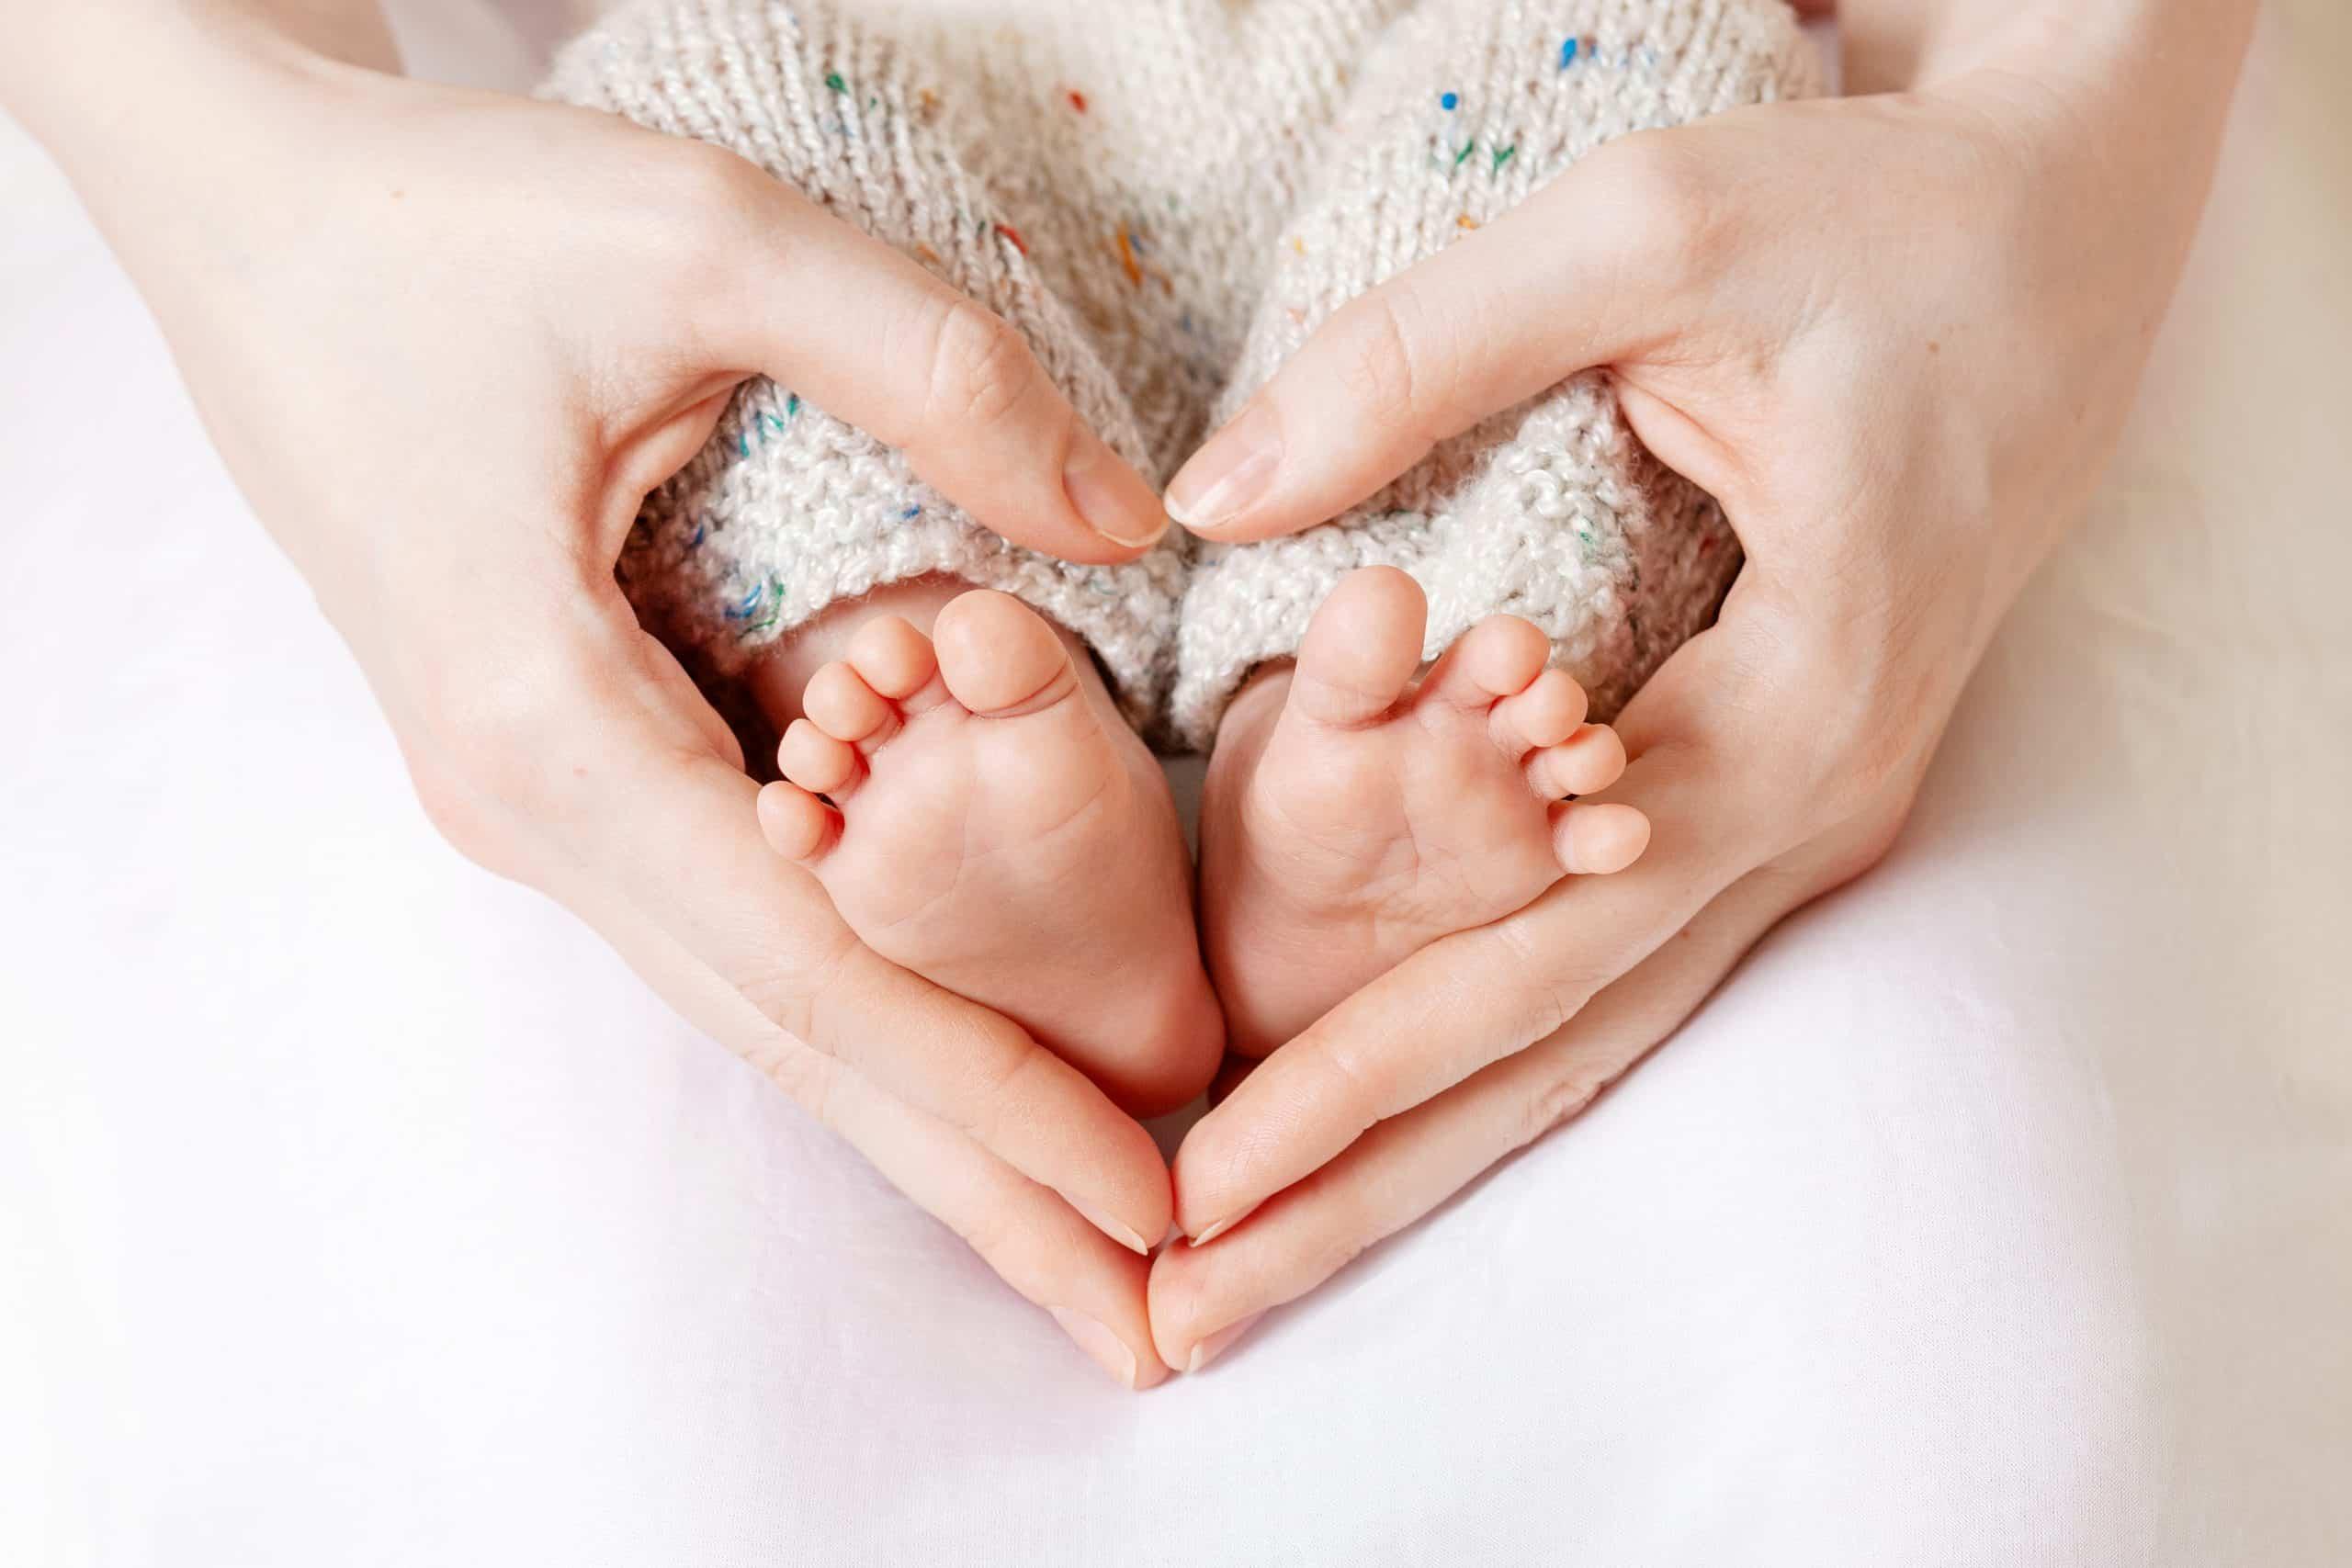 a mother cradling her newborn baby's feet